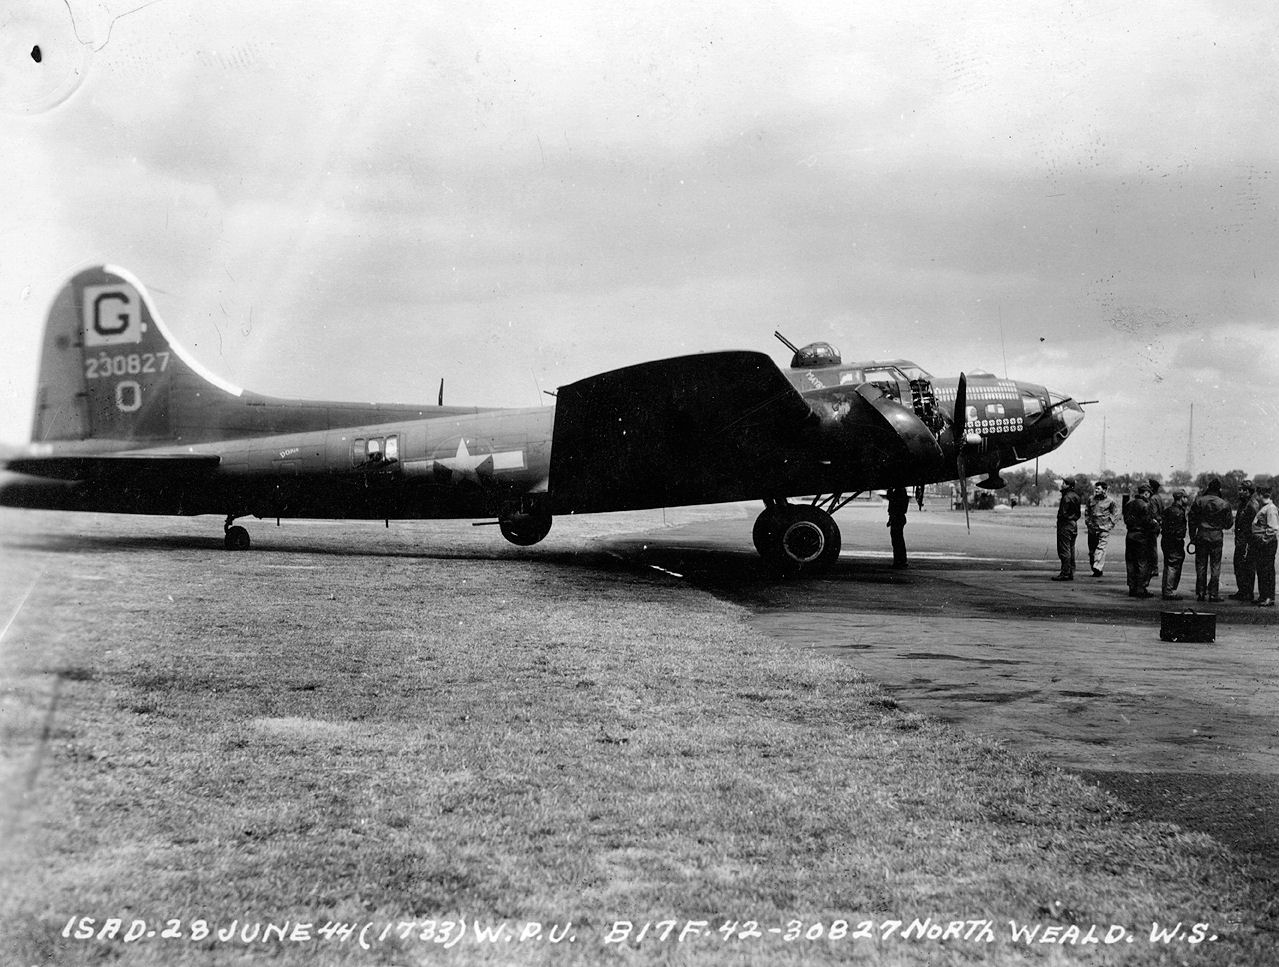 B-17 #42-30827 / Roundtrip Ticket III